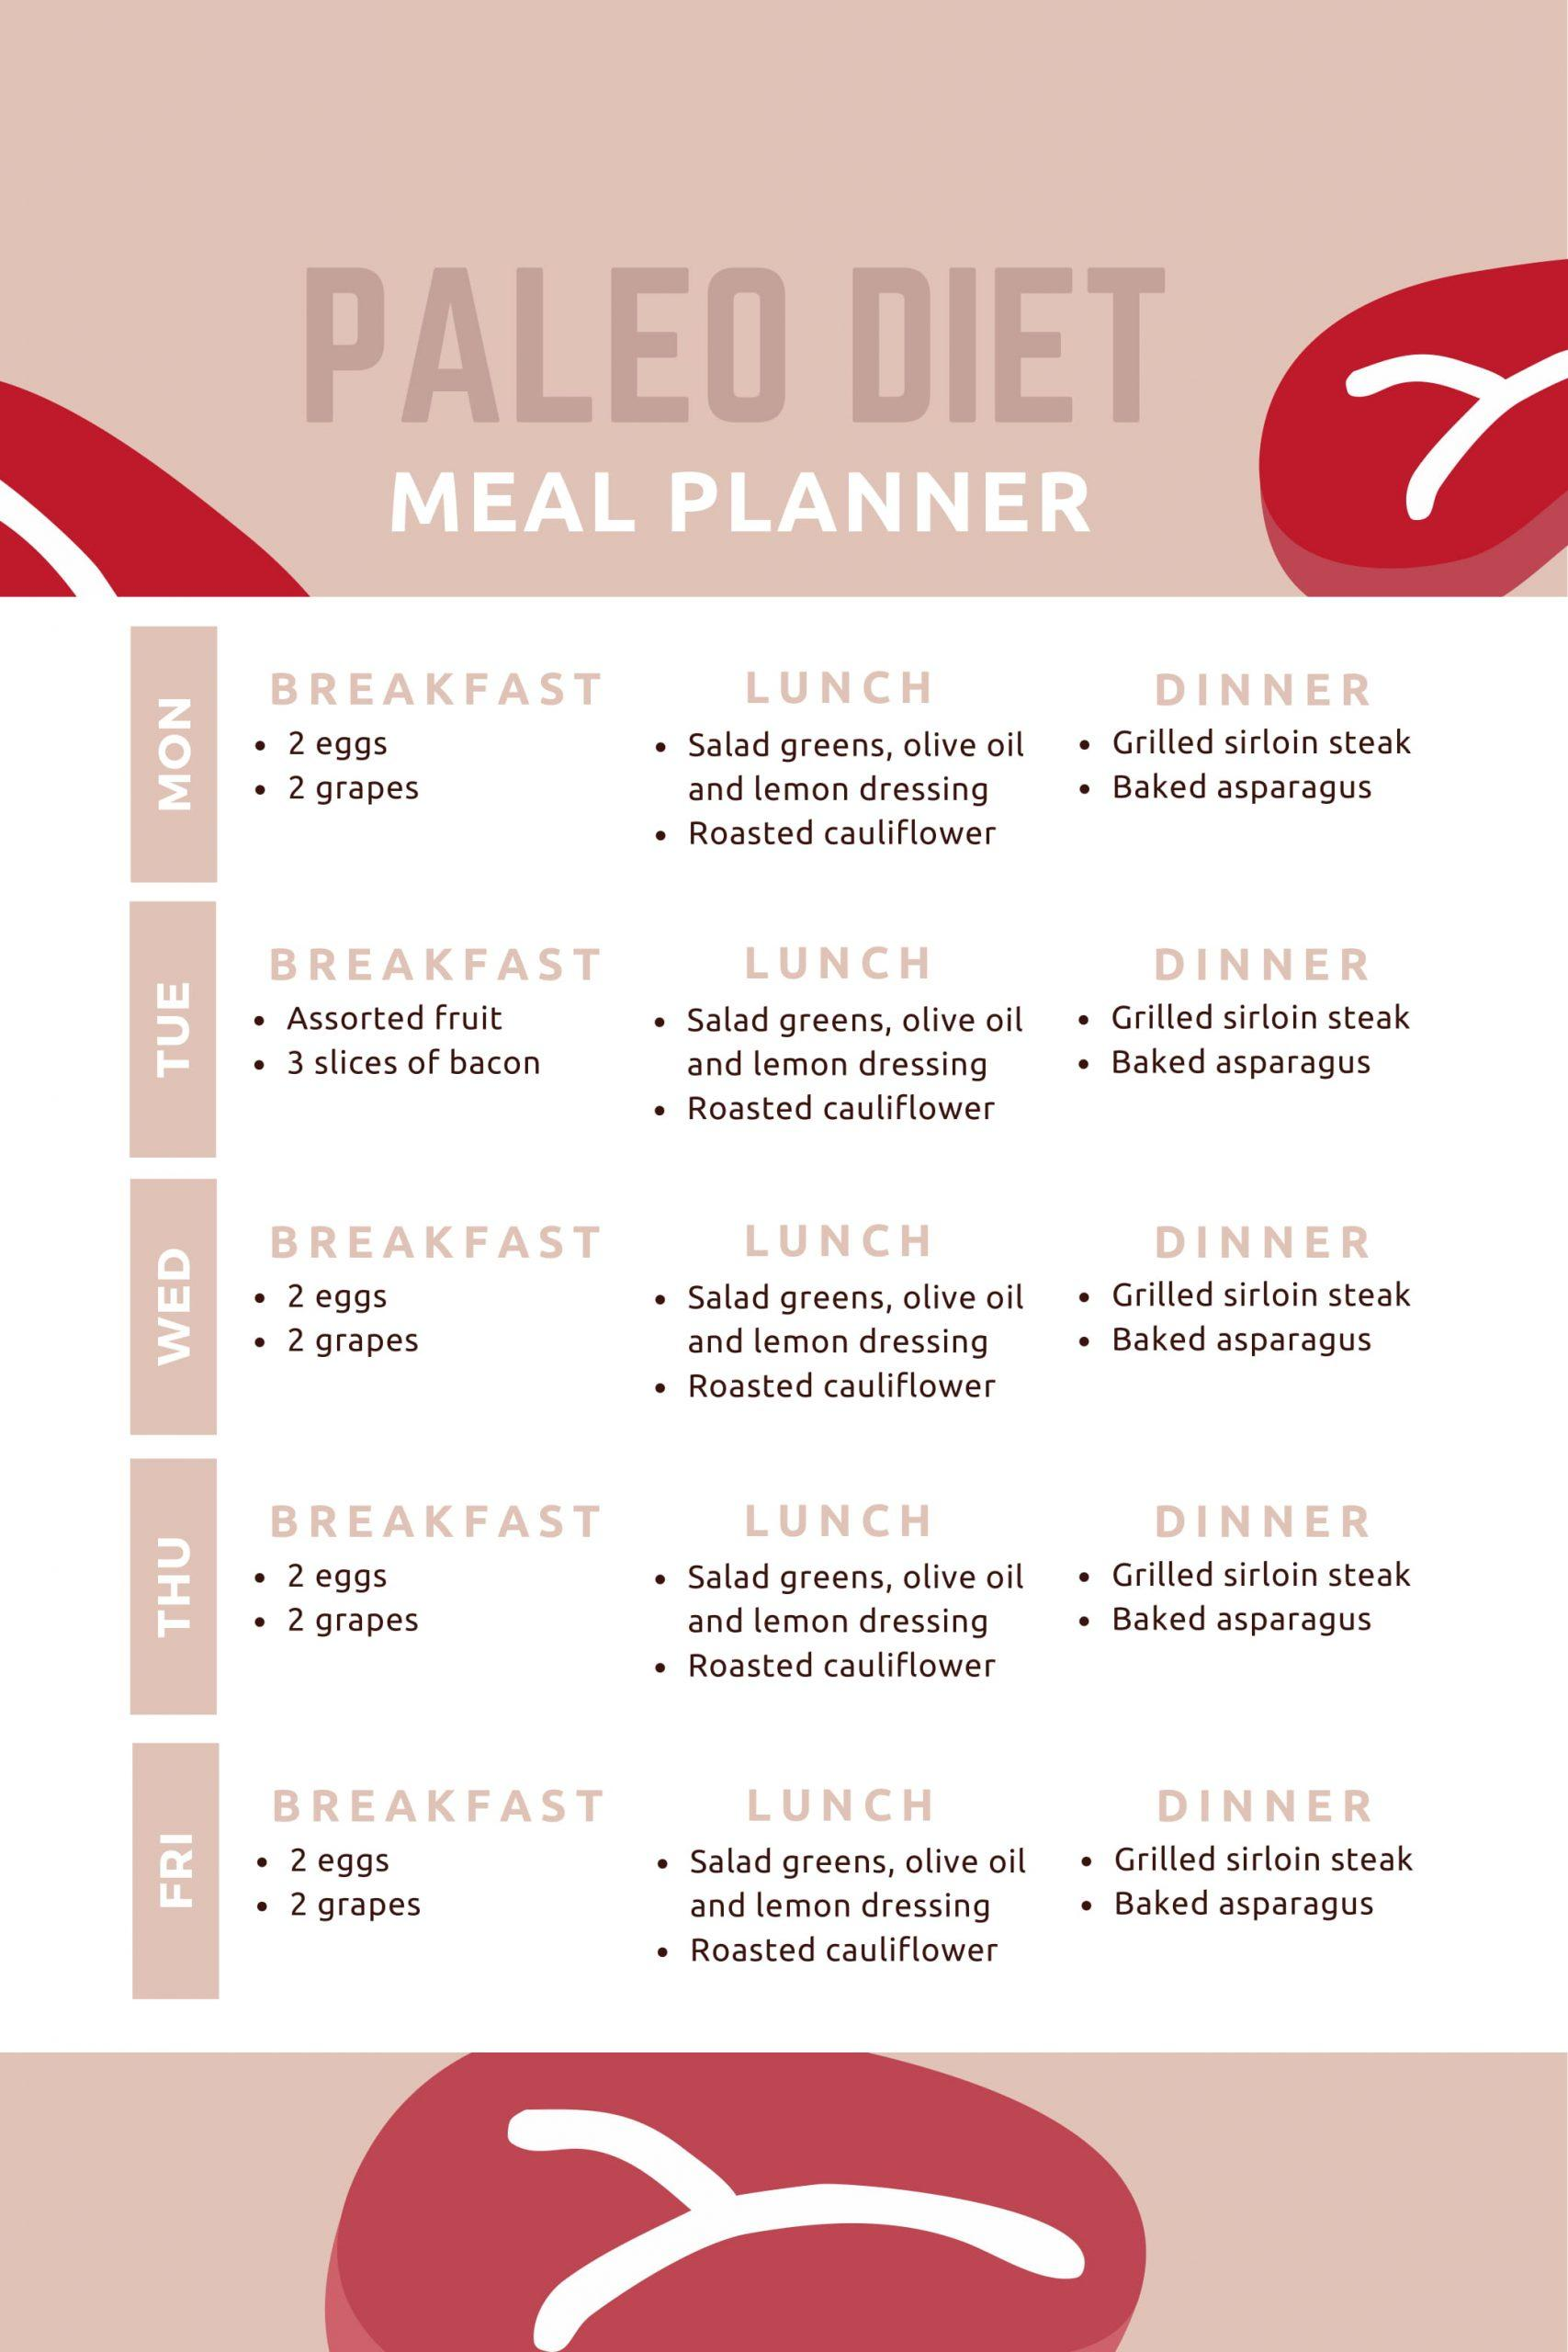 Paleo Diet Meal Planner